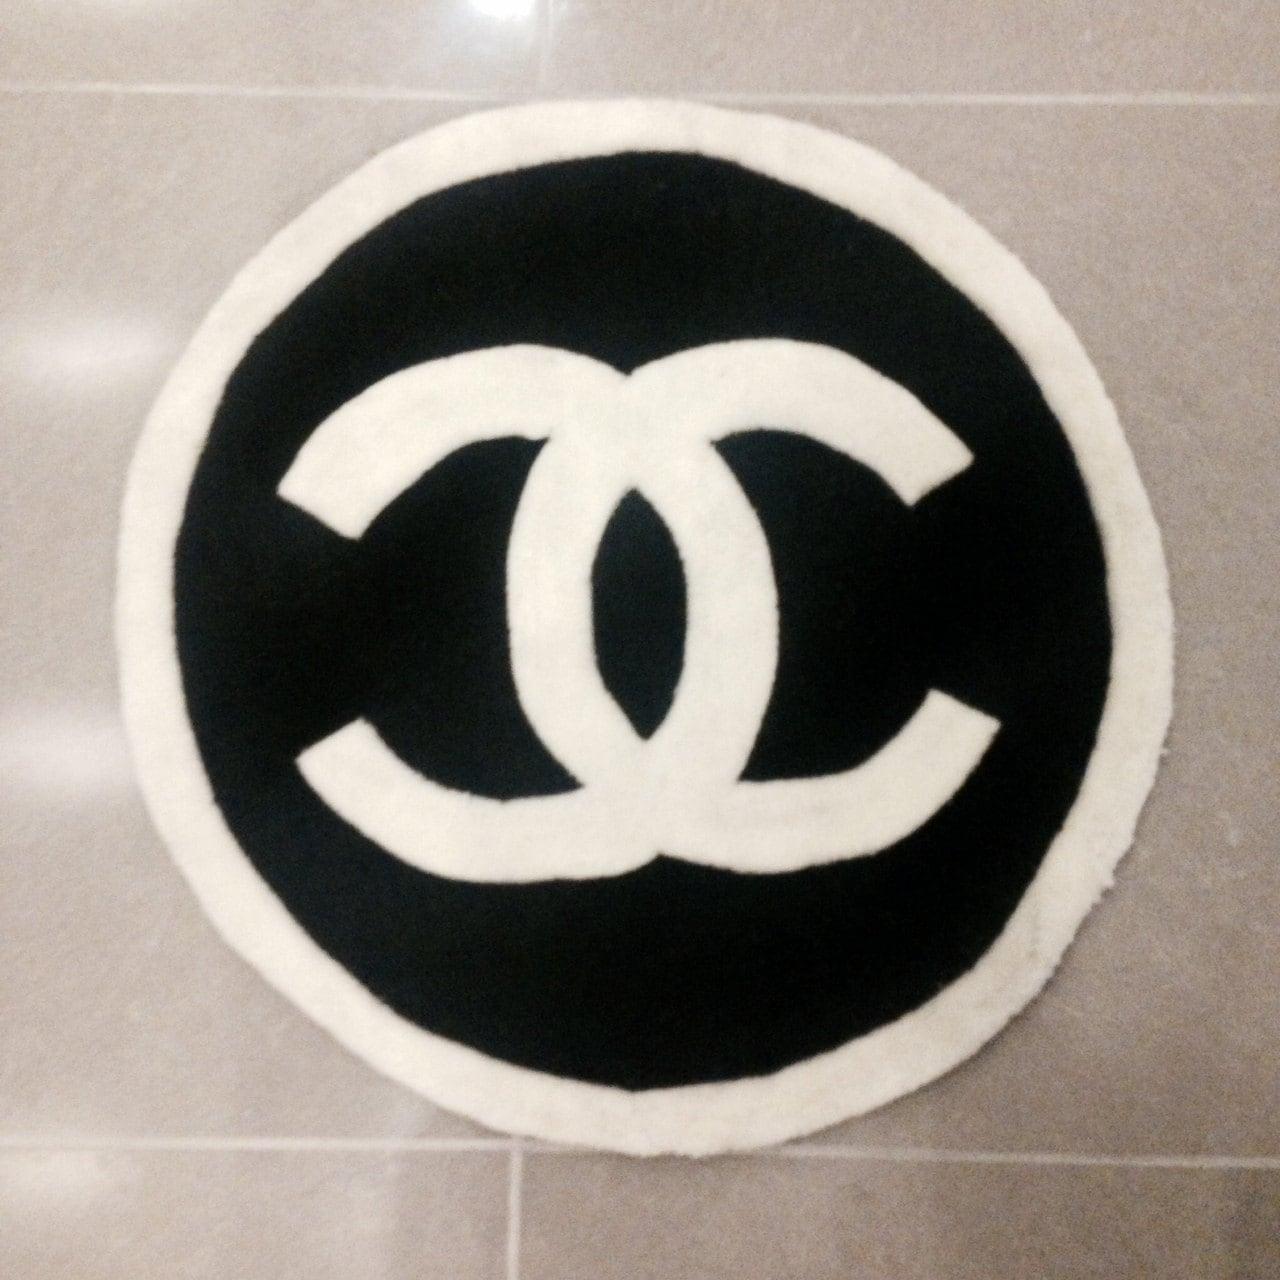 Excellent  Chanel Bathroom Bathroom Towels Chanel Home Decor Chanel Towel